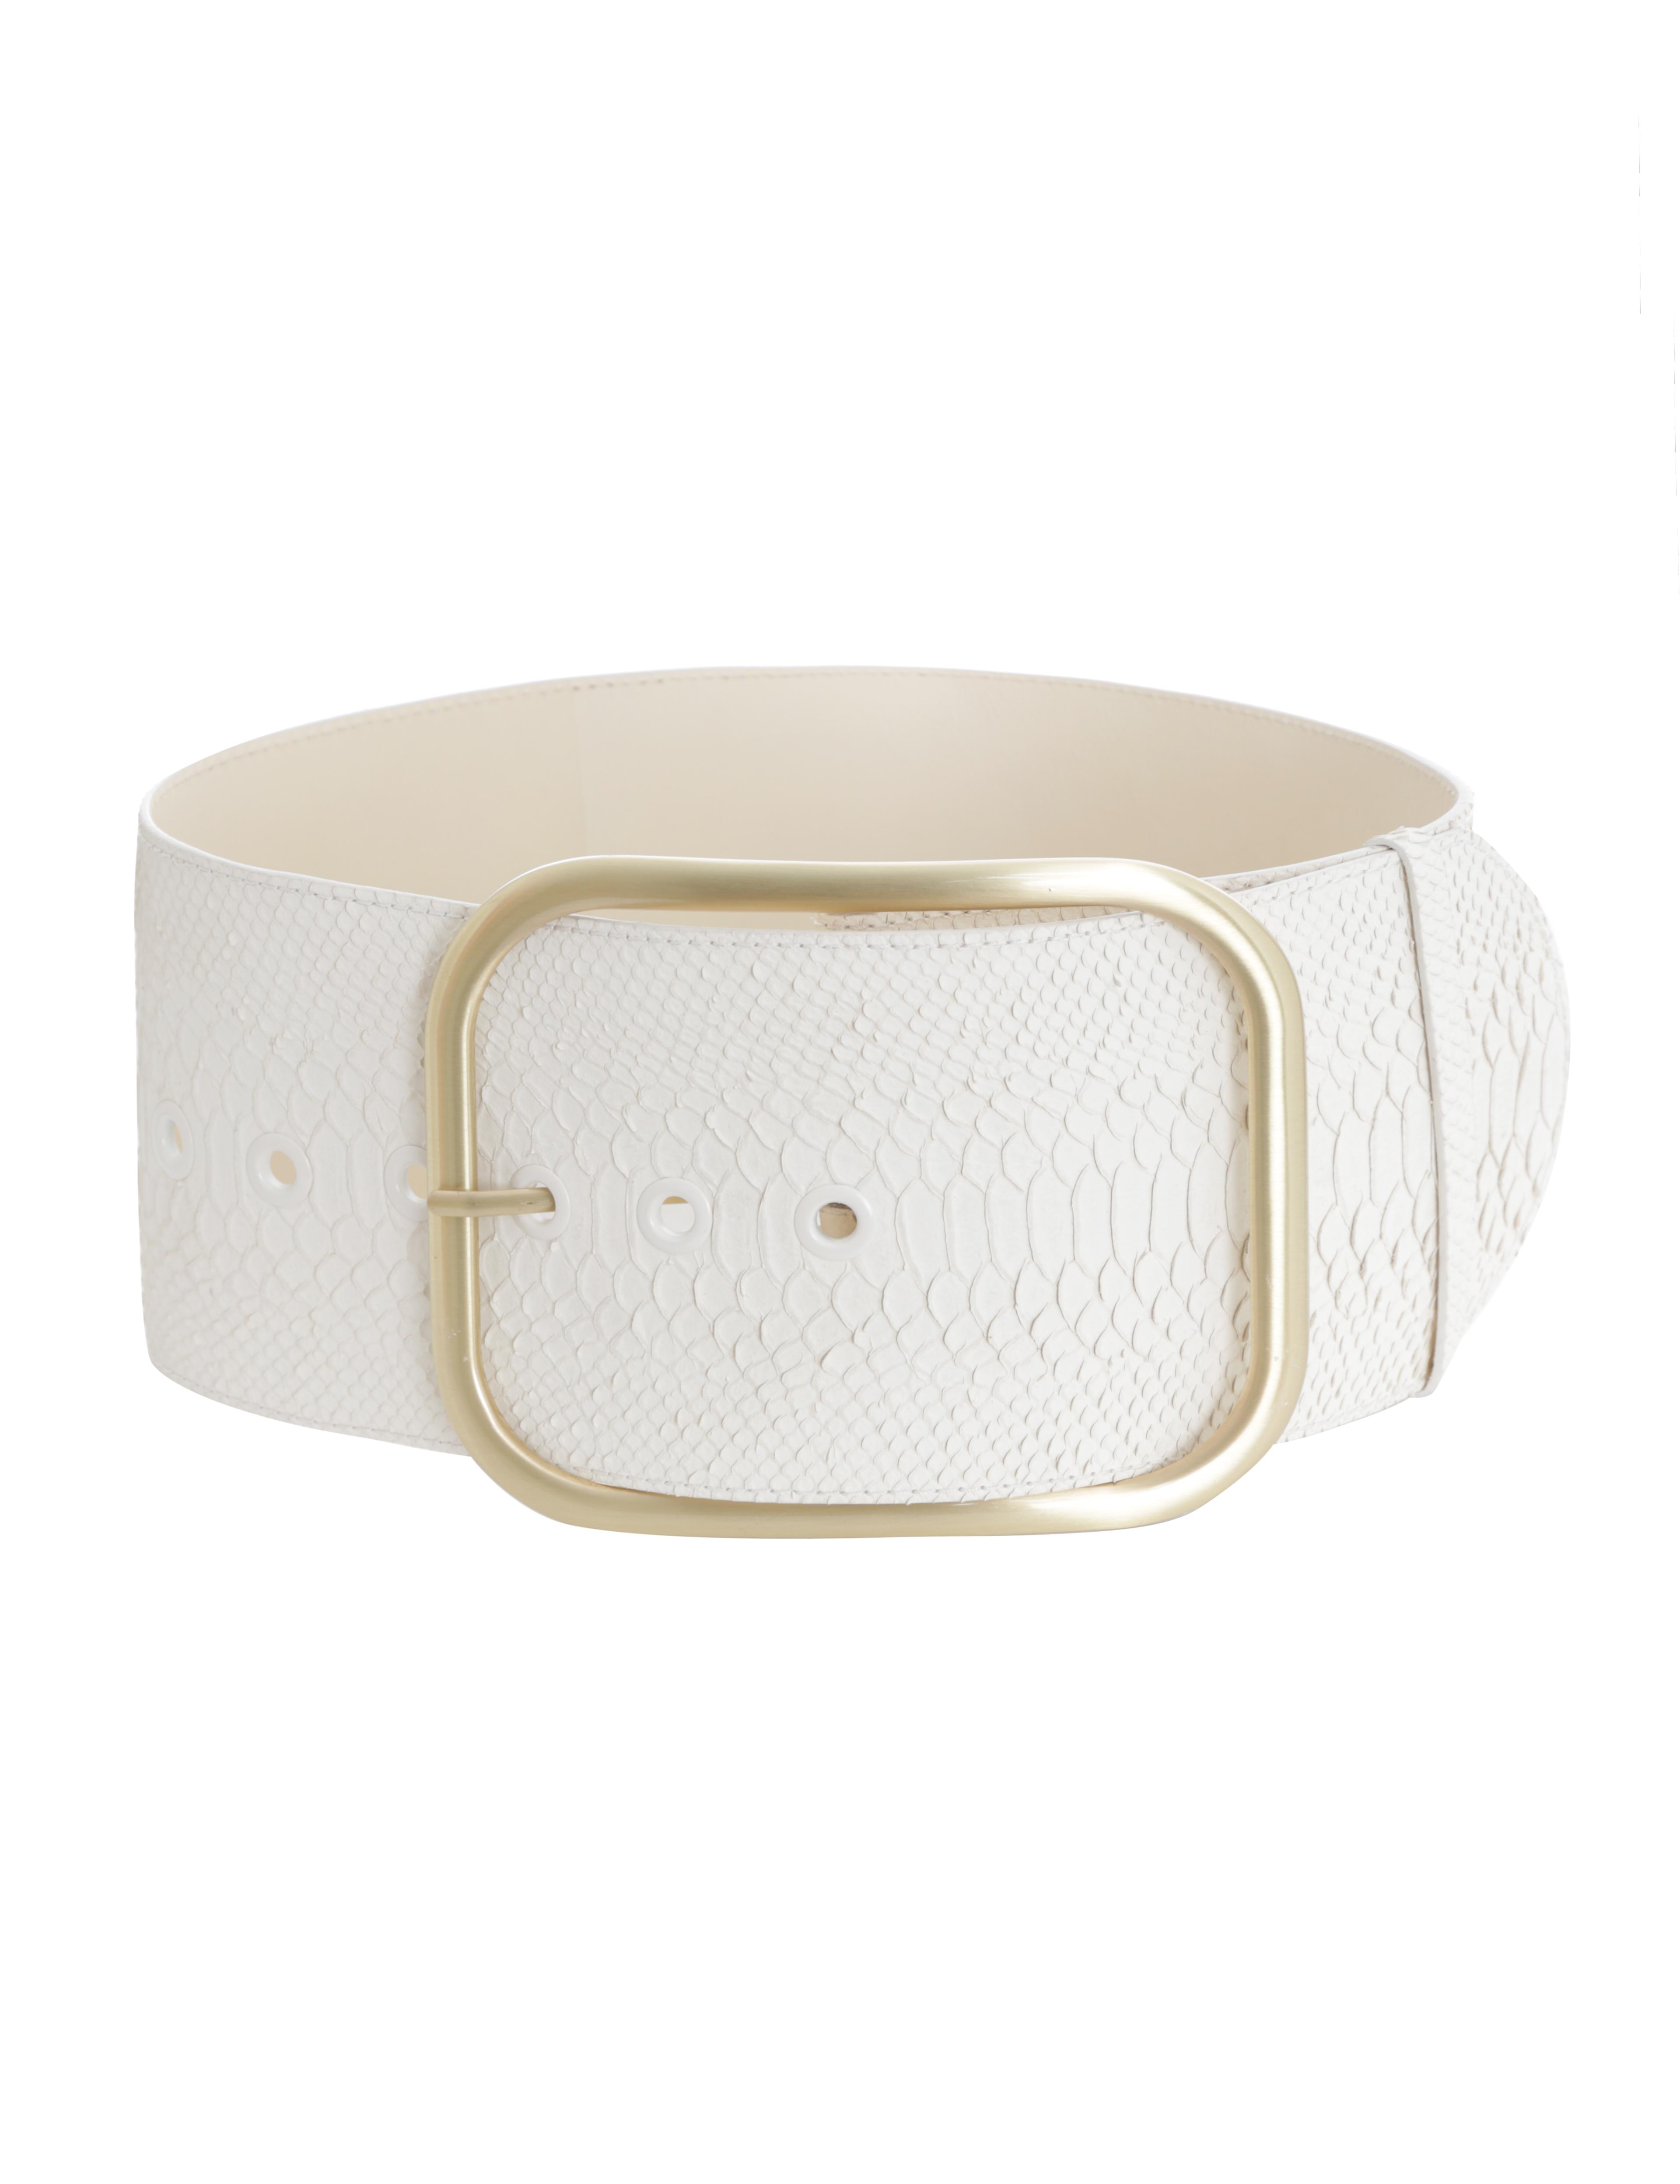 Oversized Buckle Waist Belt